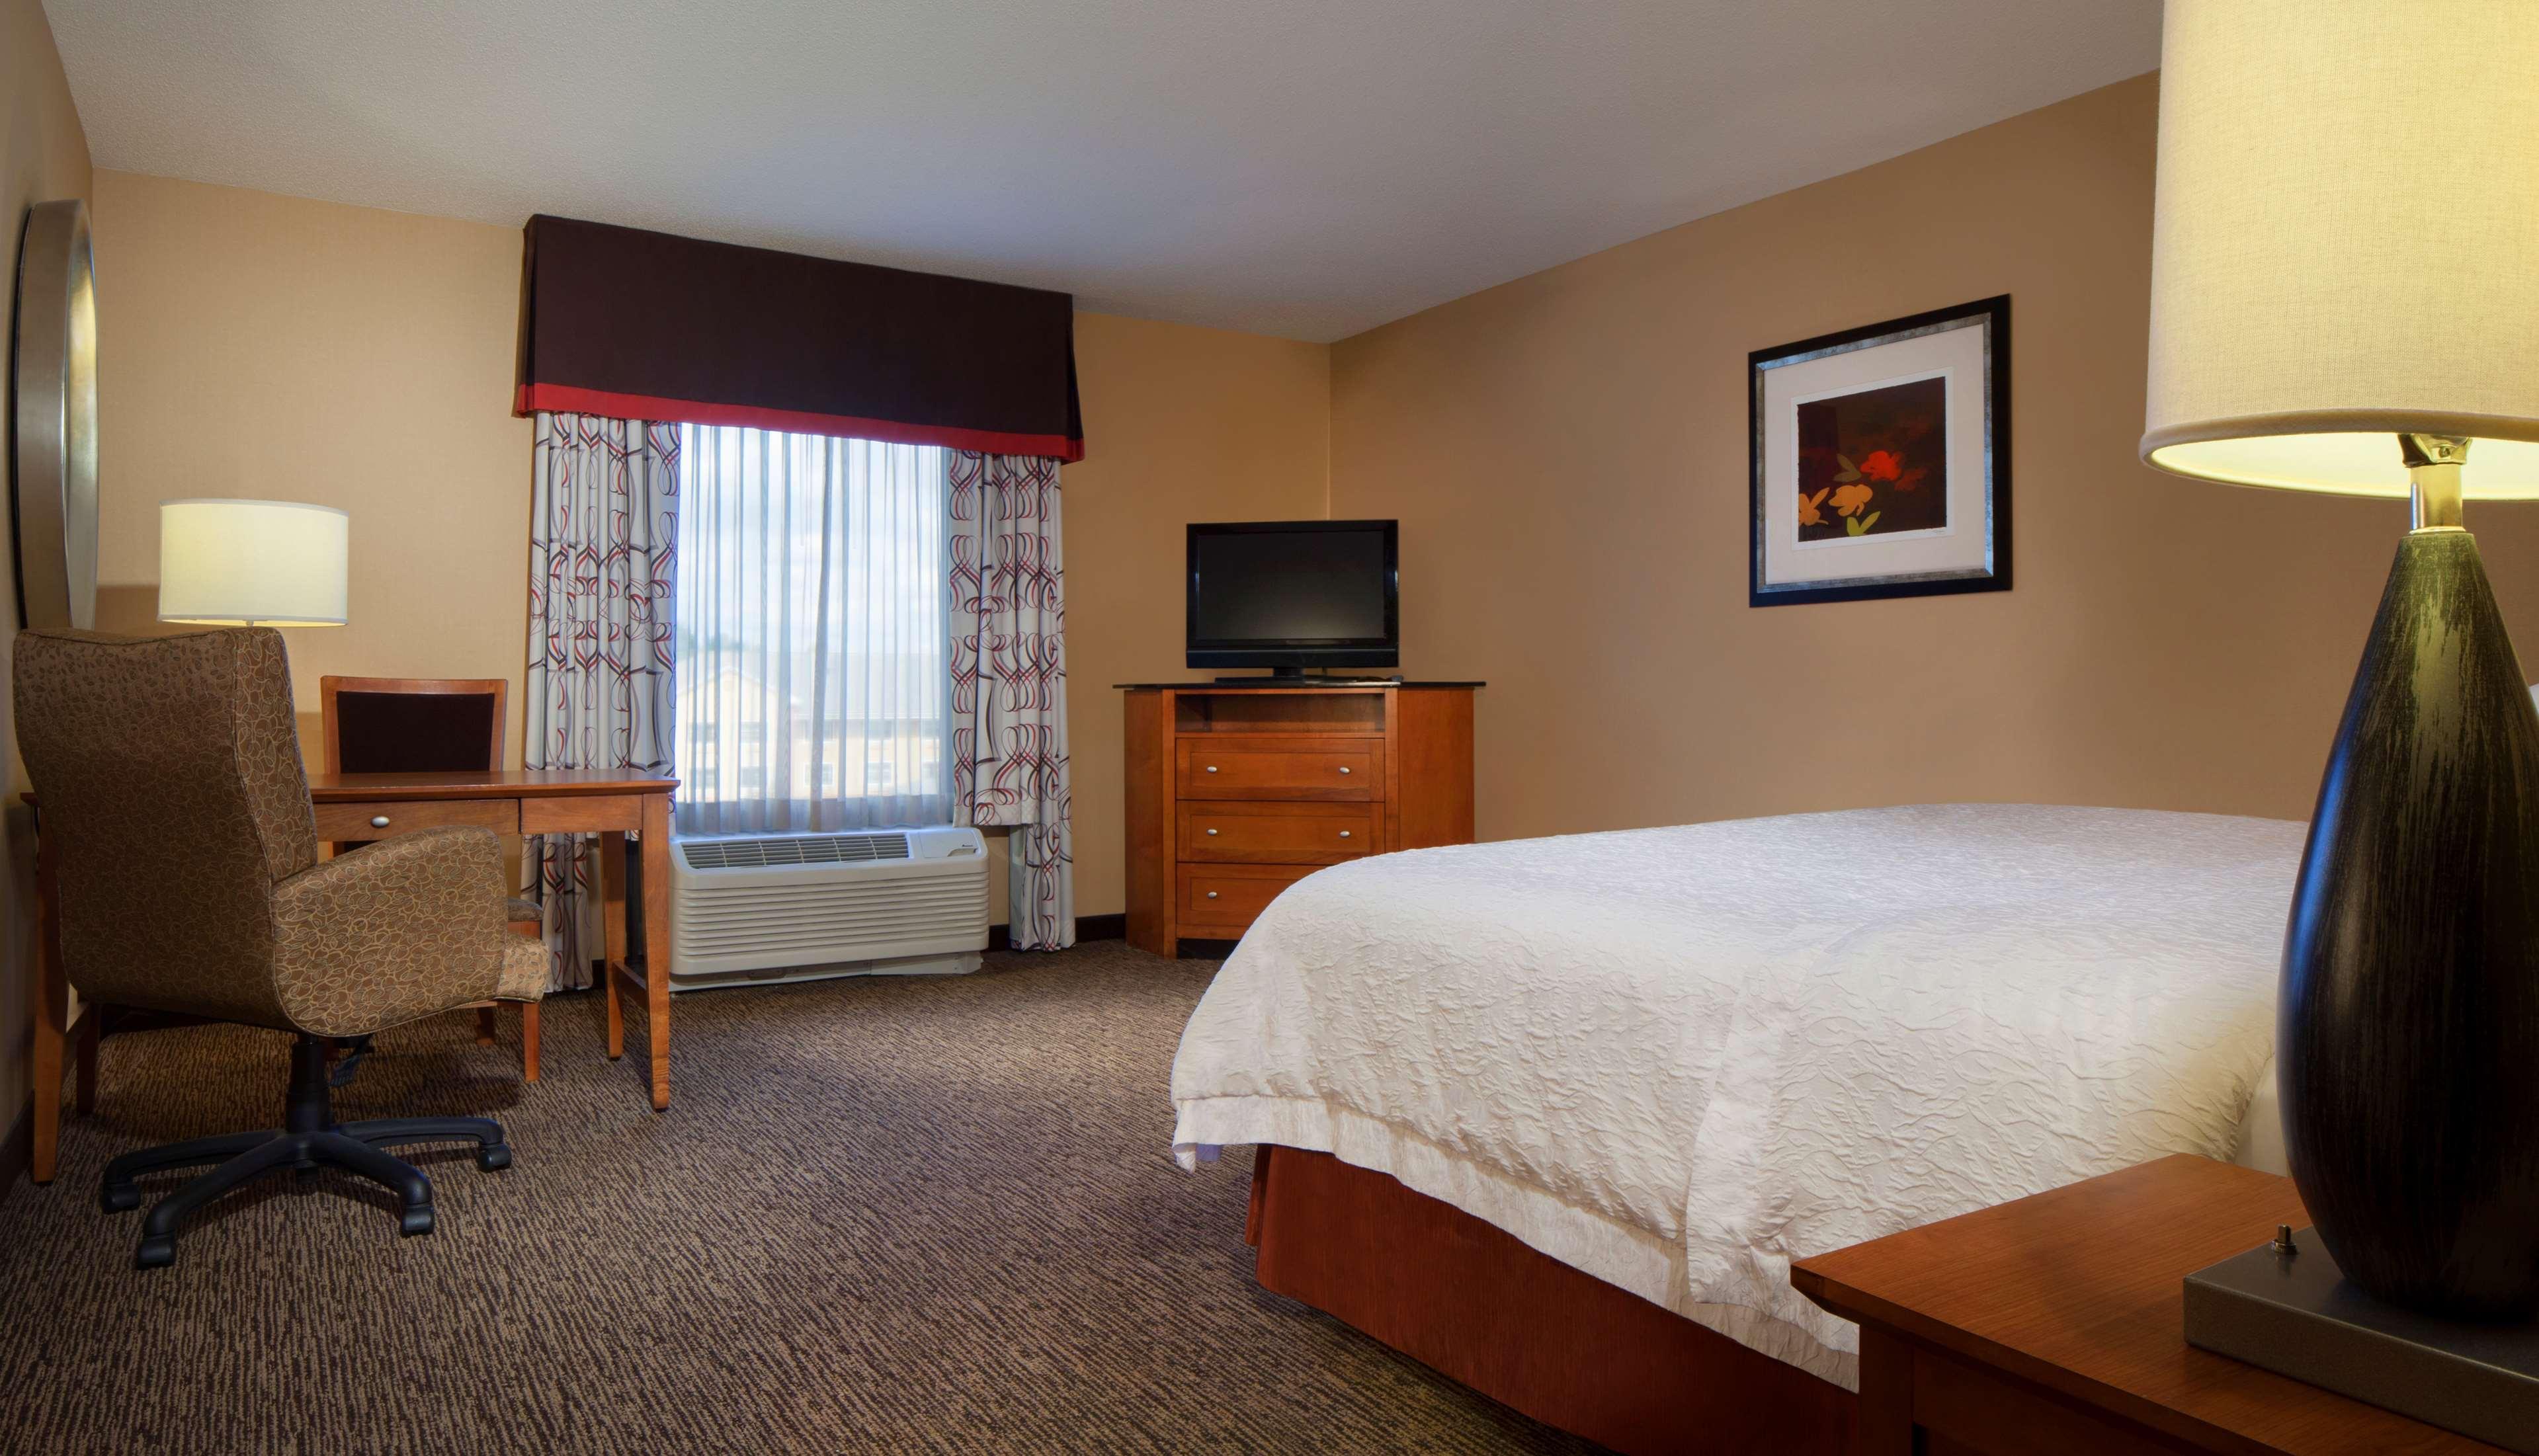 Hampton Inn & Suites Columbus-Easton Area image 28